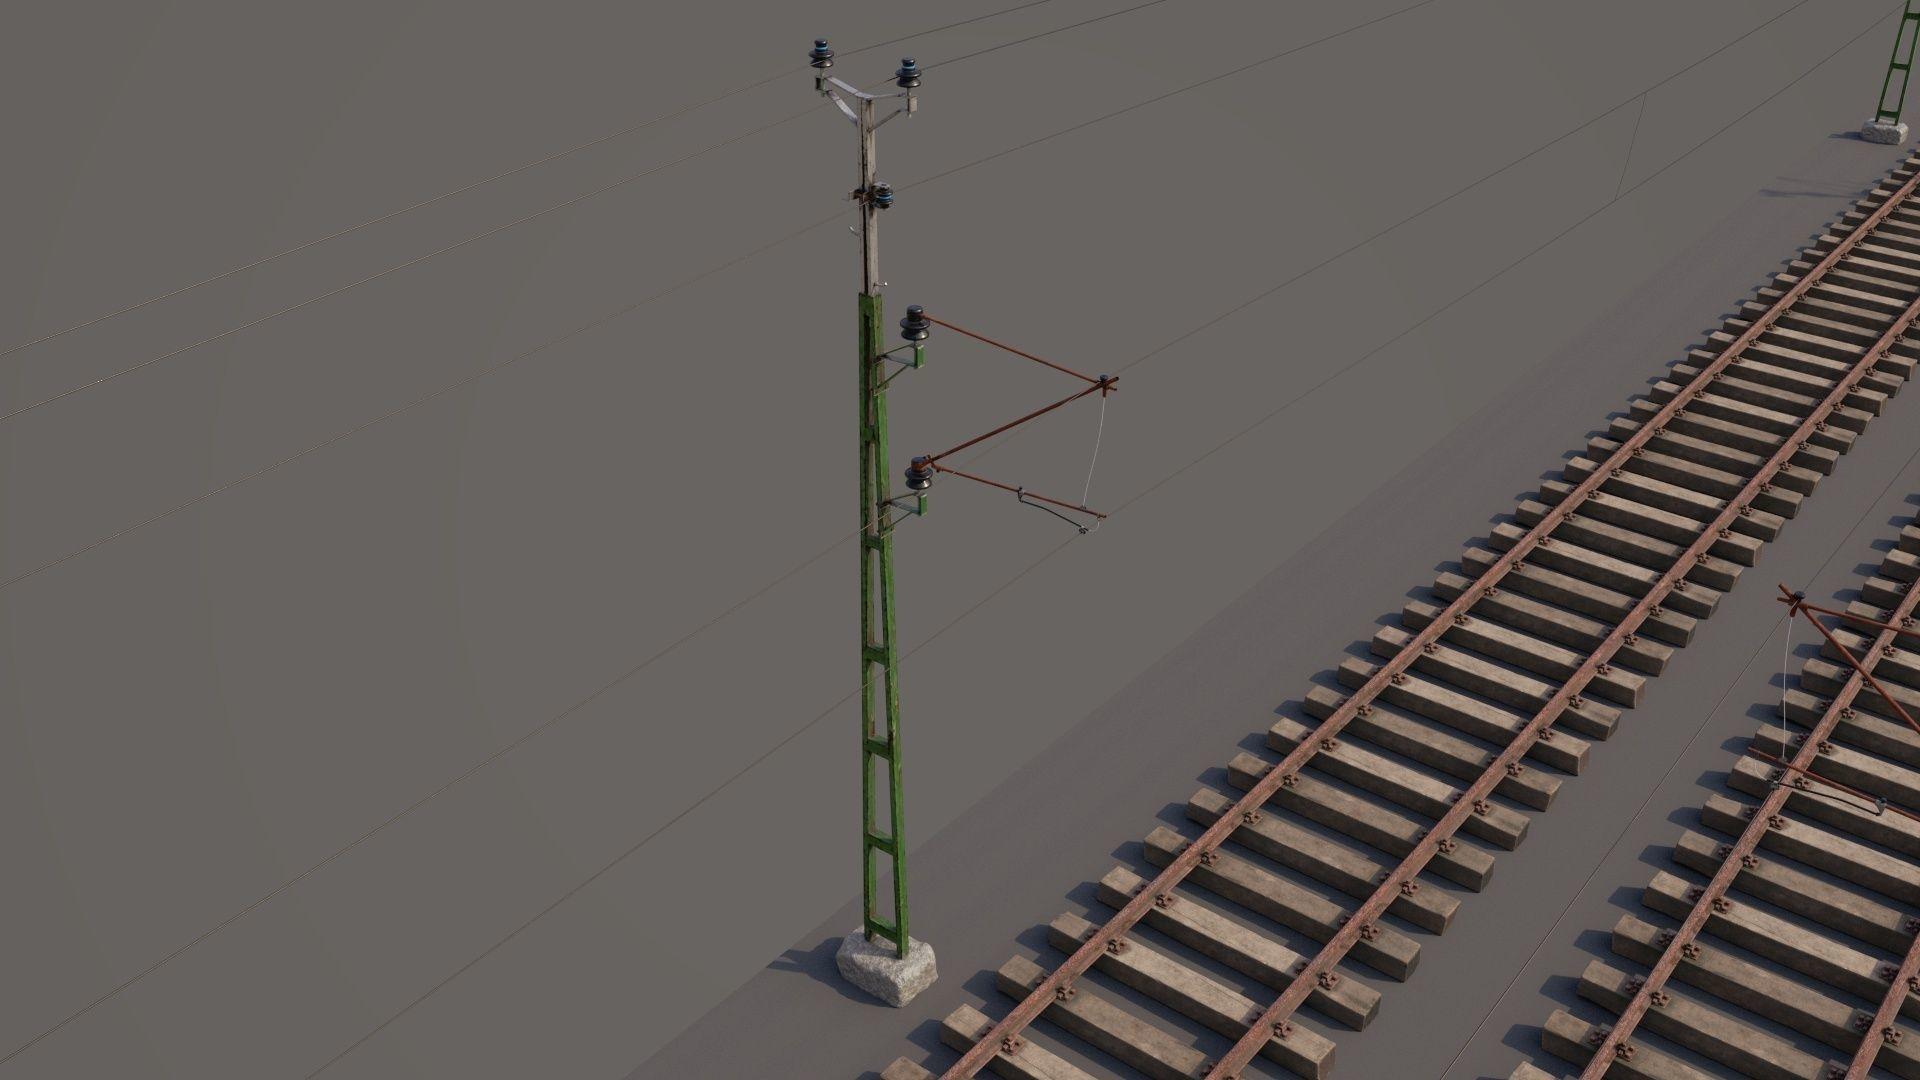 railway and overhead lines